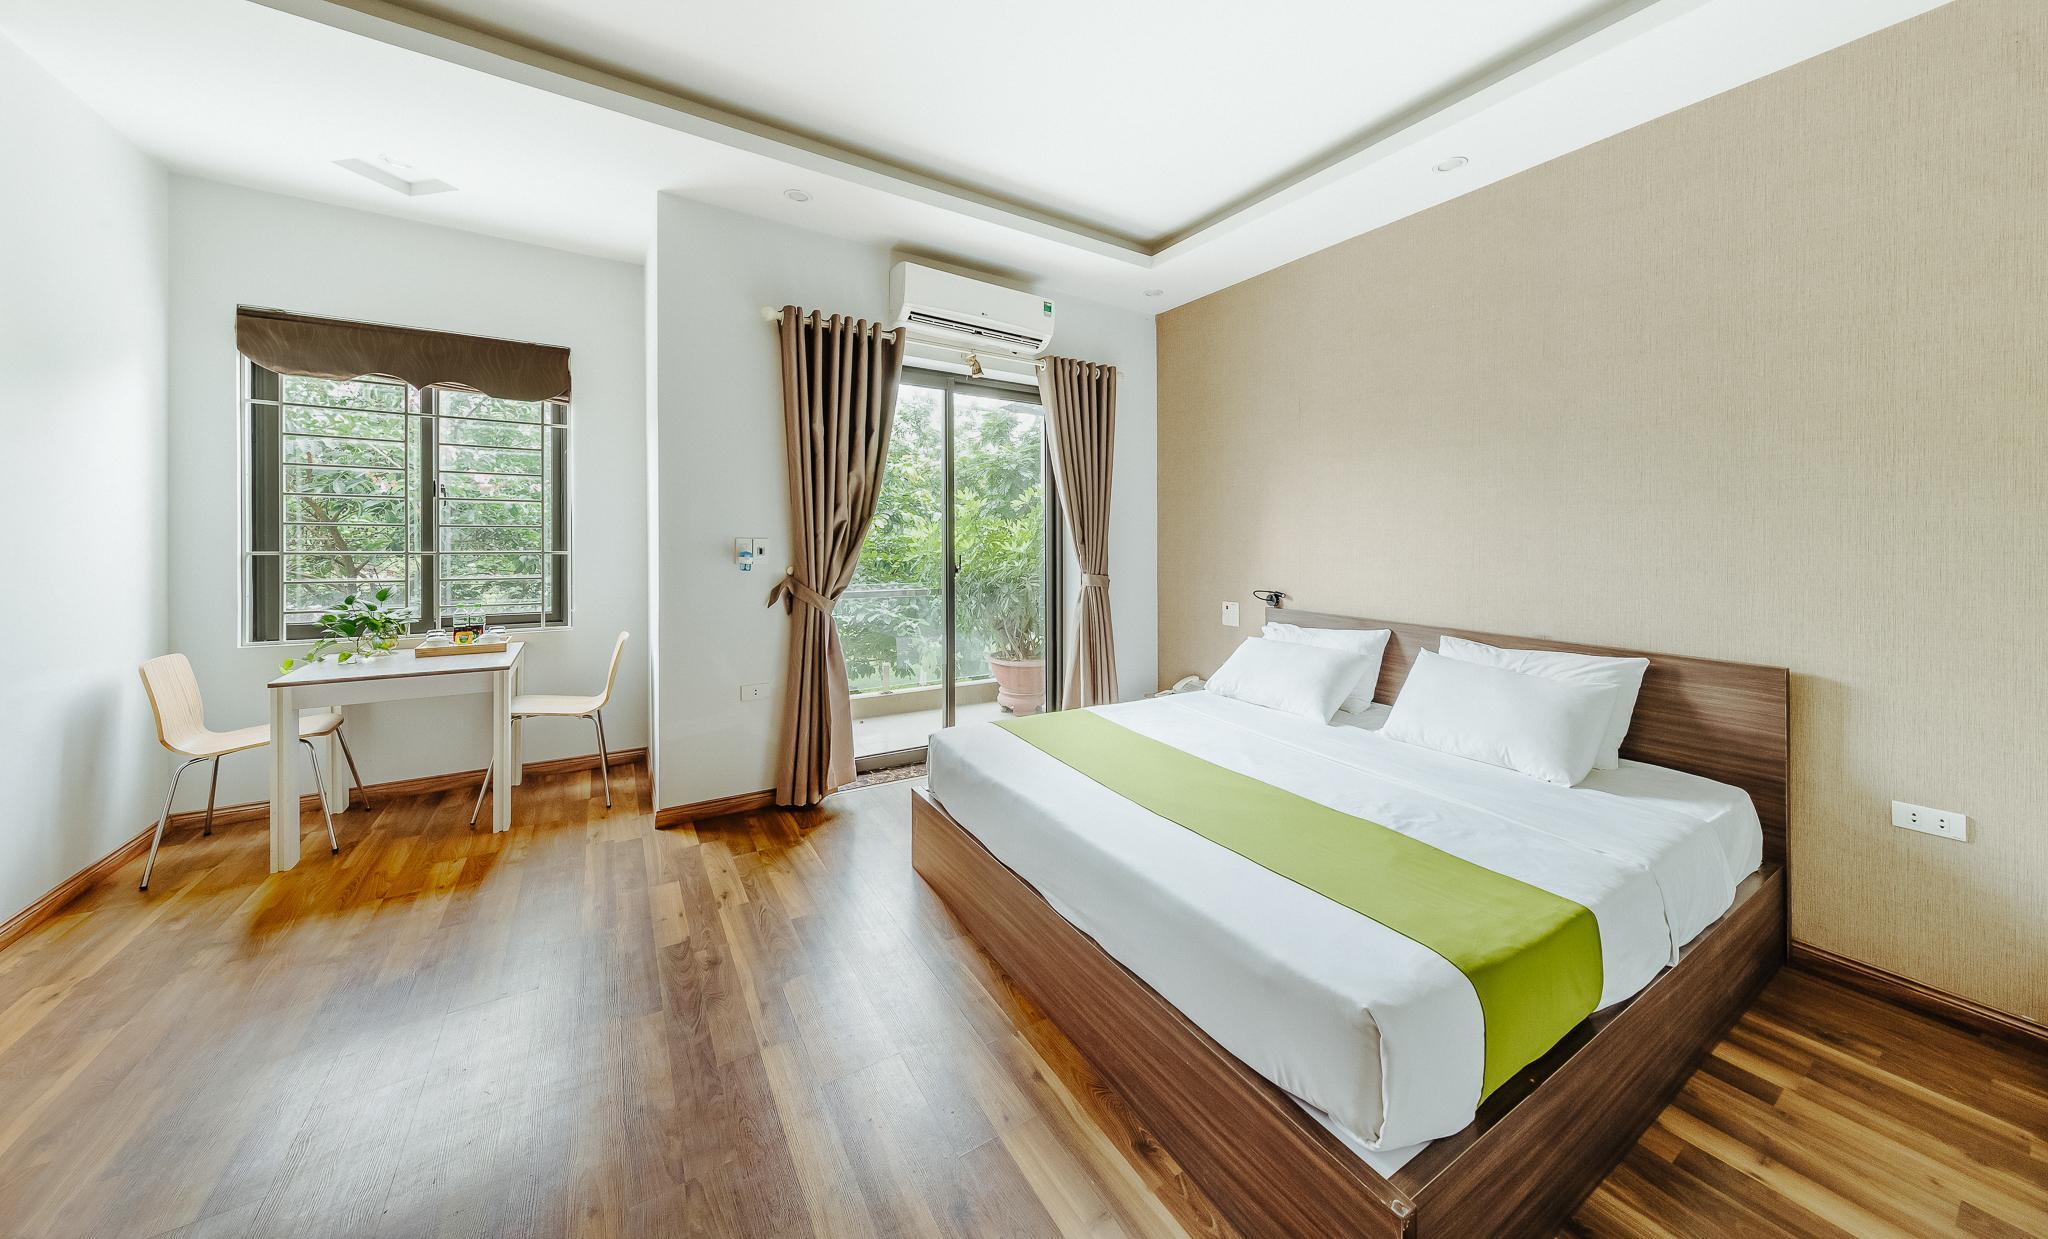 Hana 1 Apartment And Hotel Bac Ninh